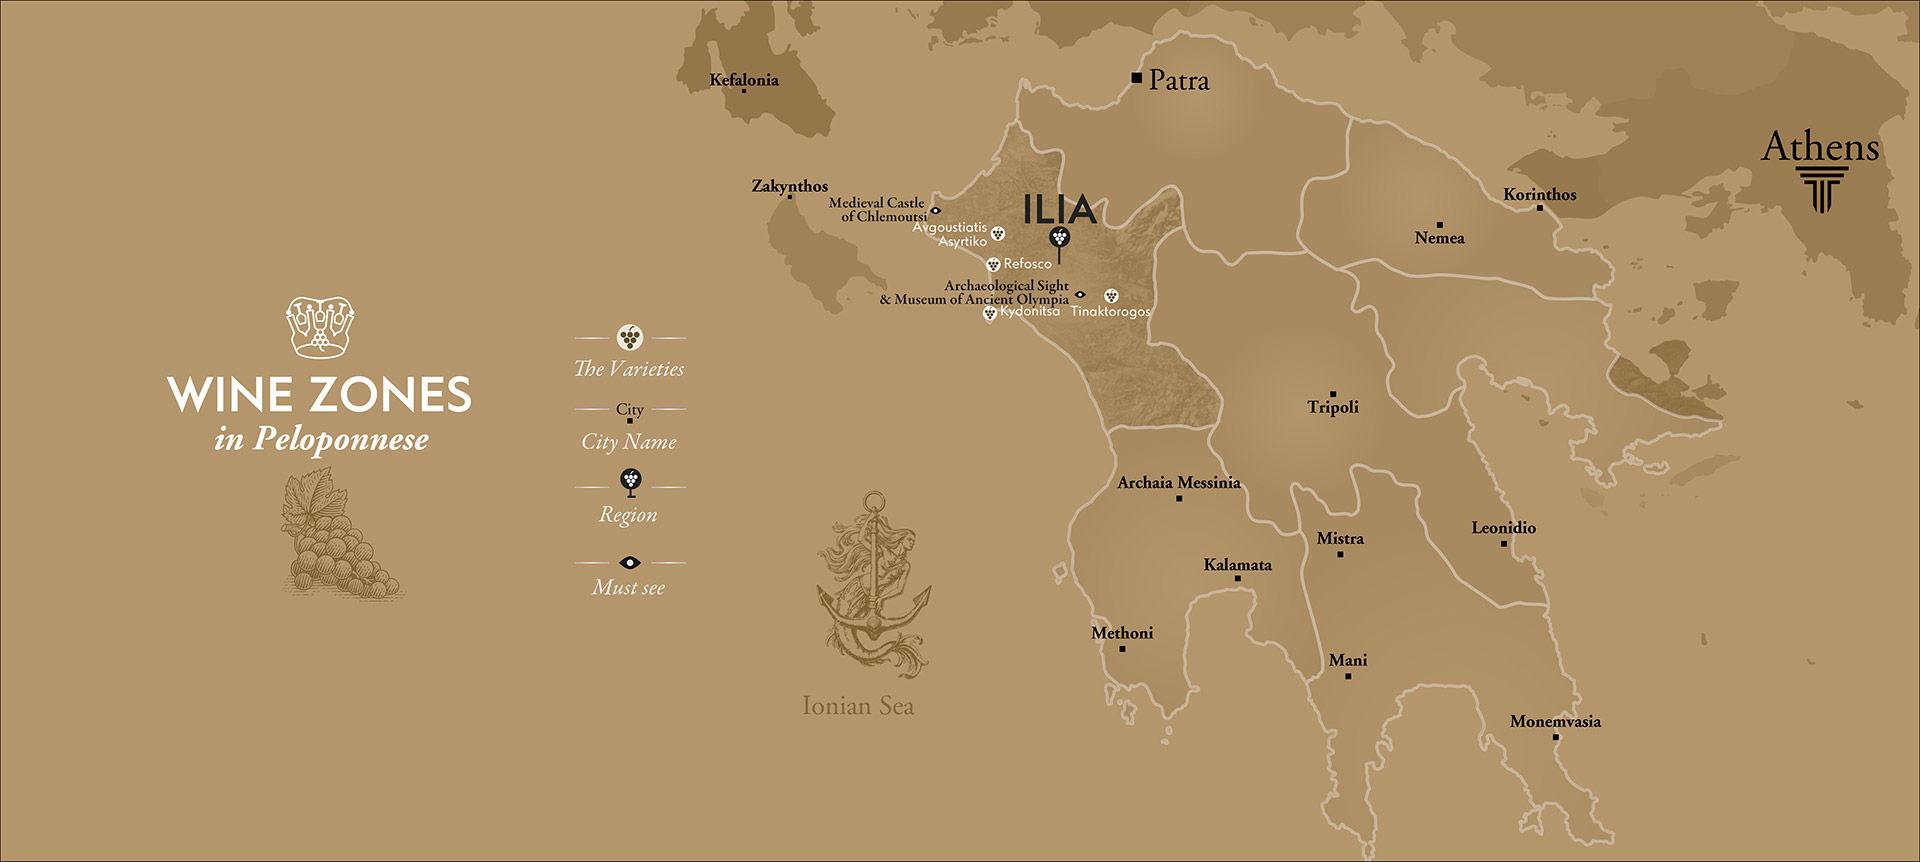 Ancient Olympia wine tours Greece, luxury wine tourism, Peloponnese wine tour, private wine tour